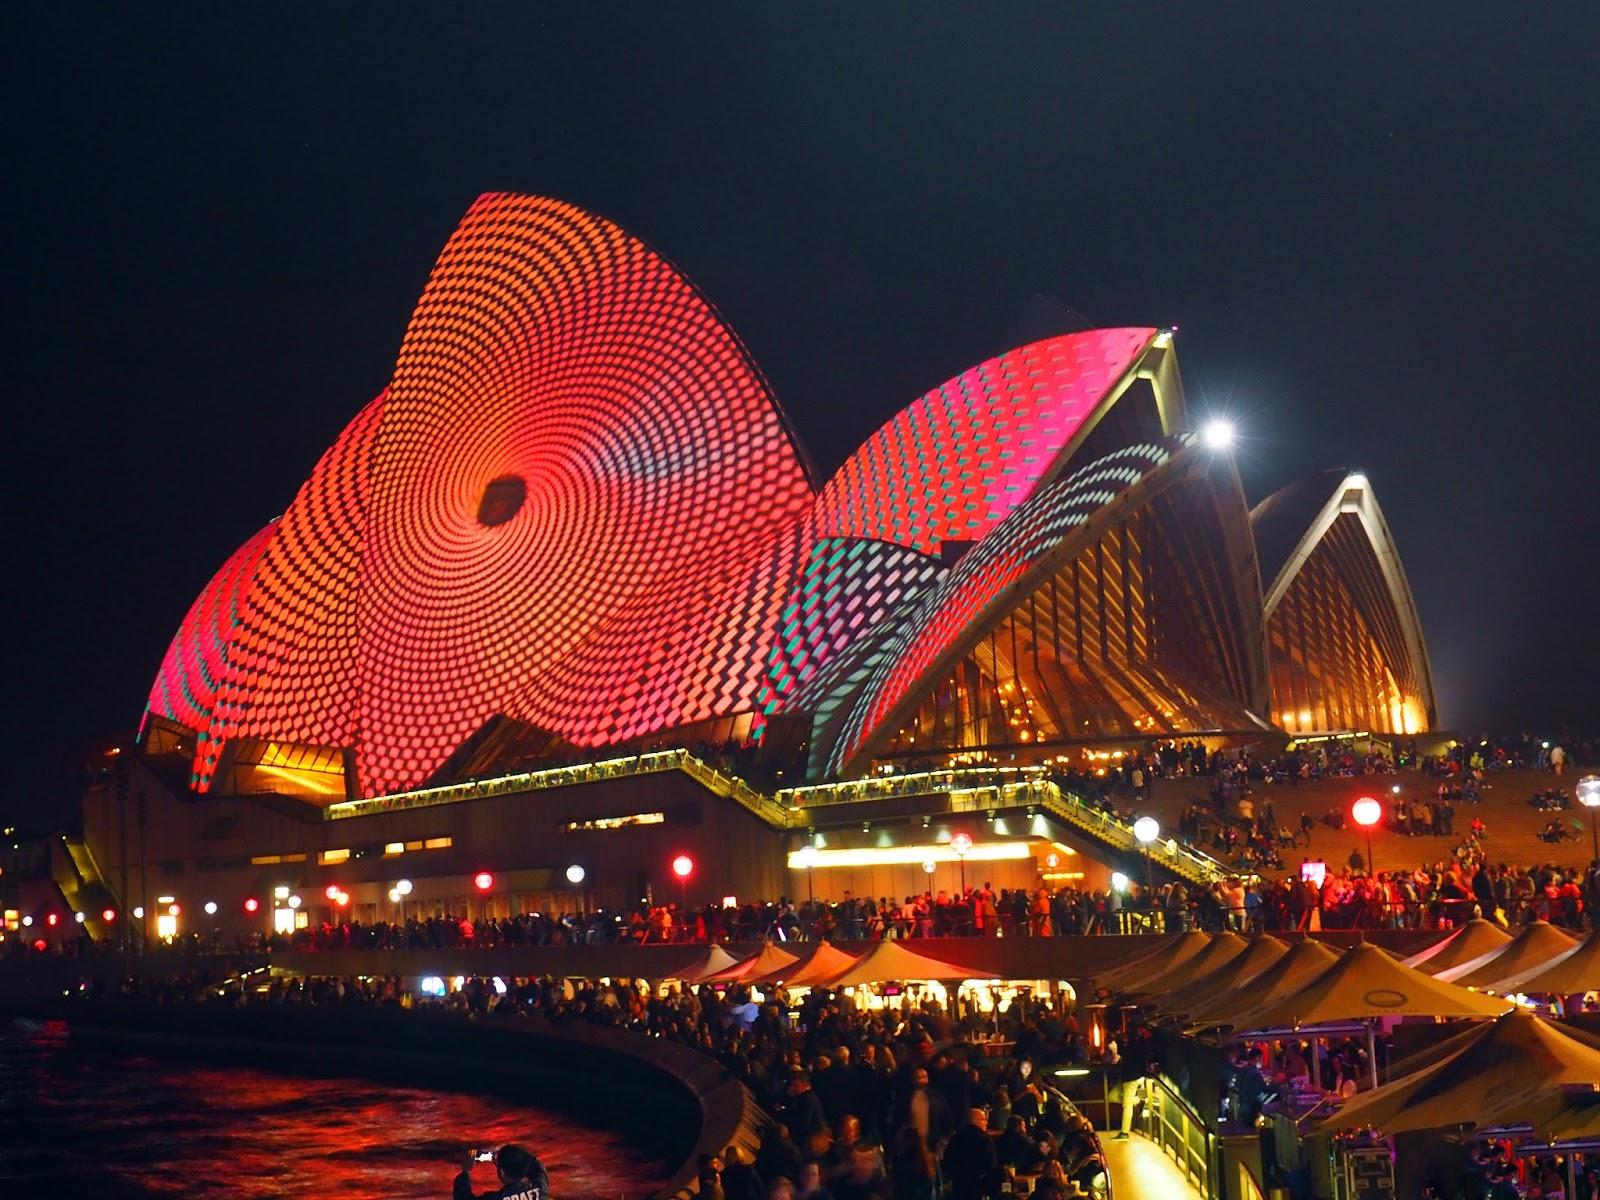 Opera House at Vivid festival